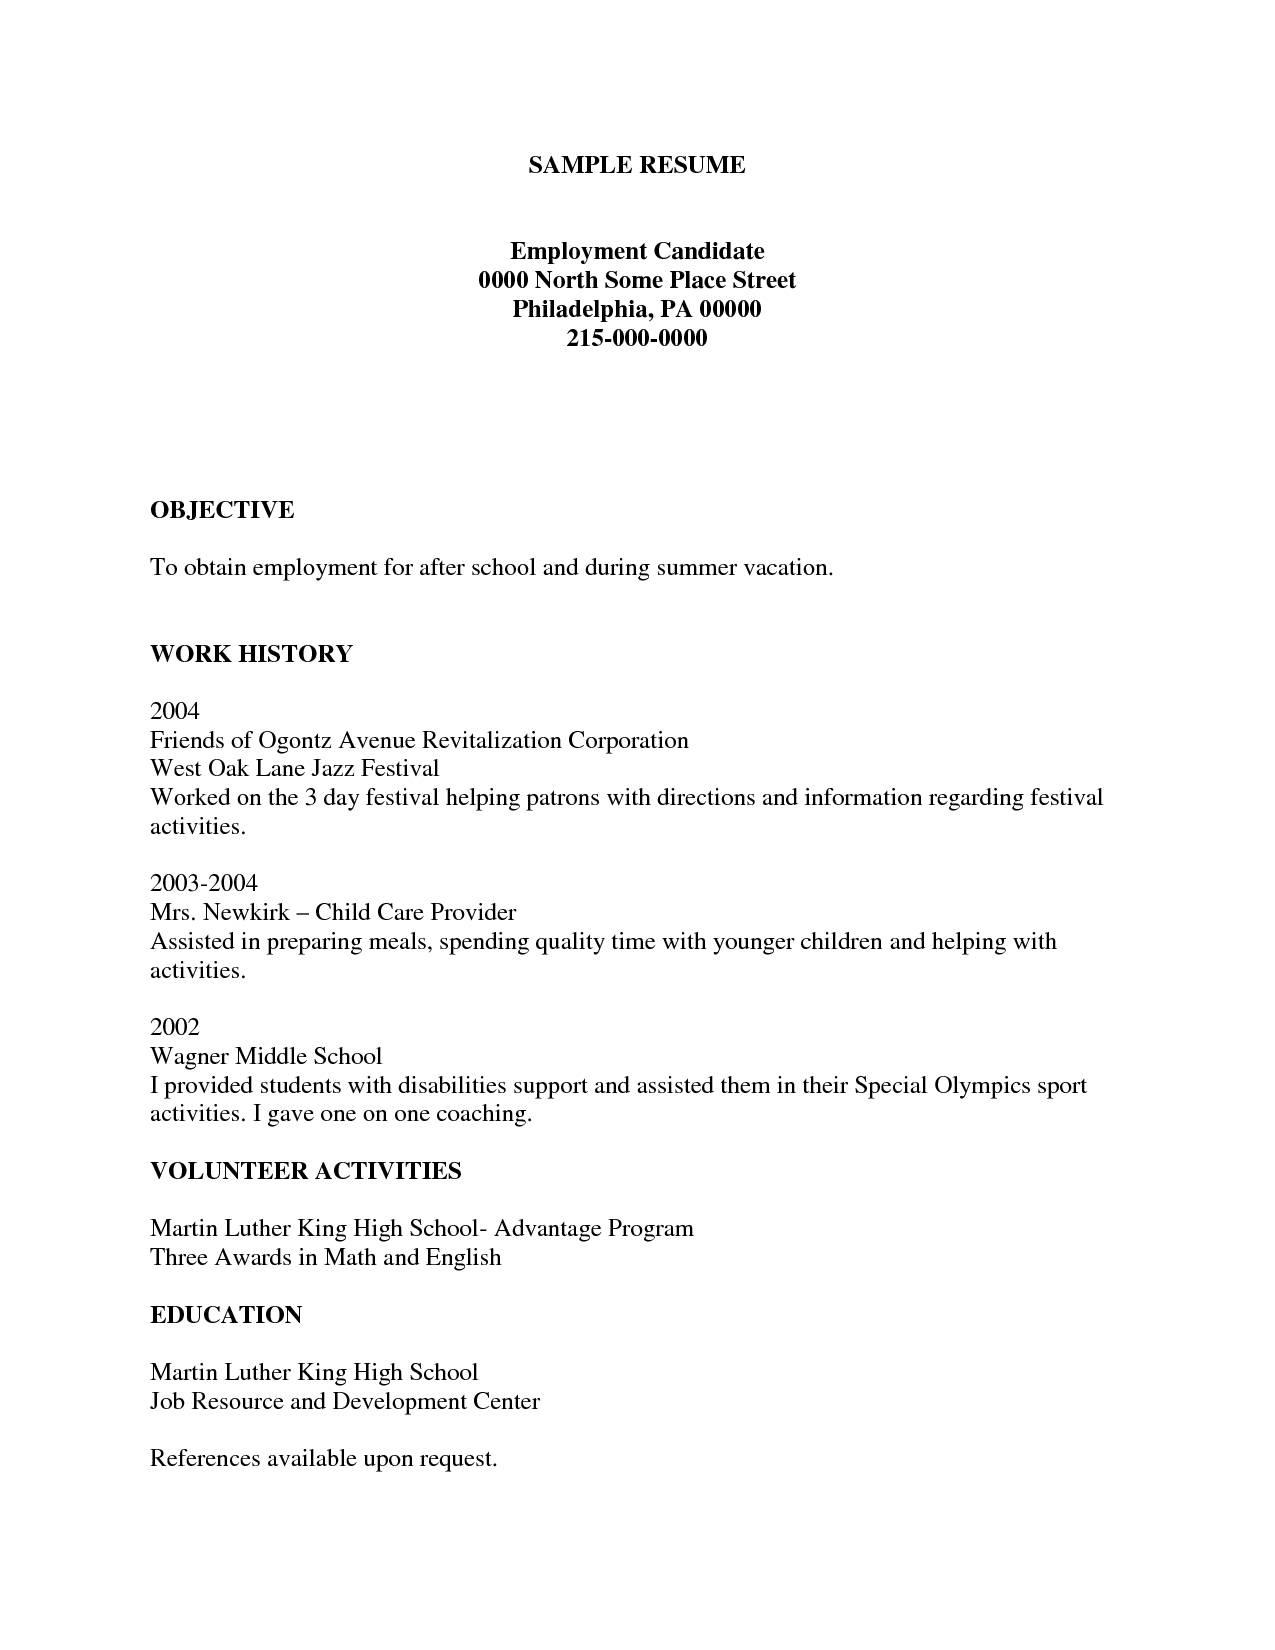 001 Free Blank Resume Templates Printable Template ~ Ulyssesroom - Free Printable Blank Resume